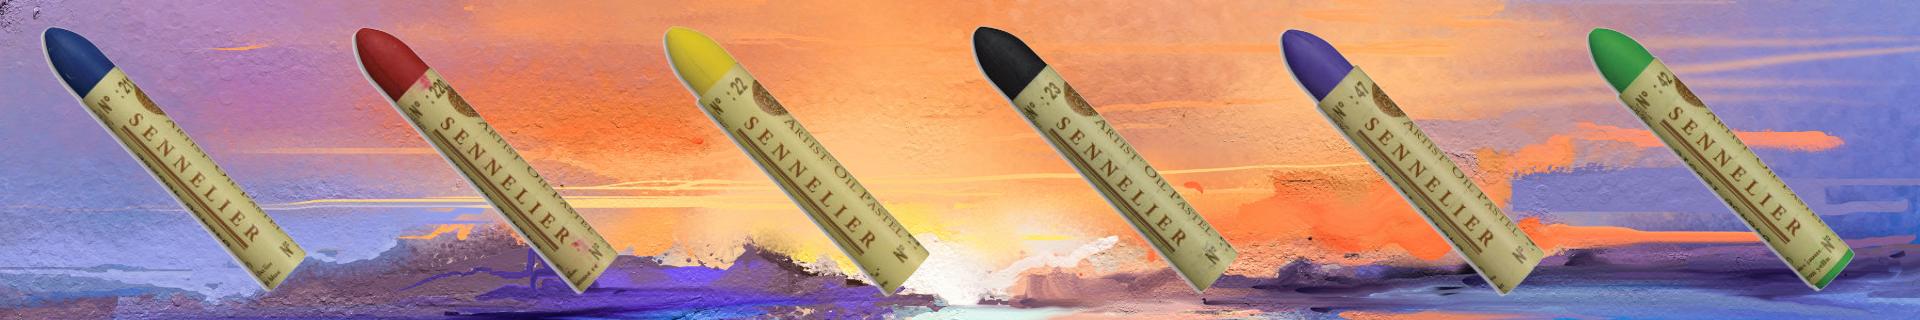 Pastelli ad olio Sennelier